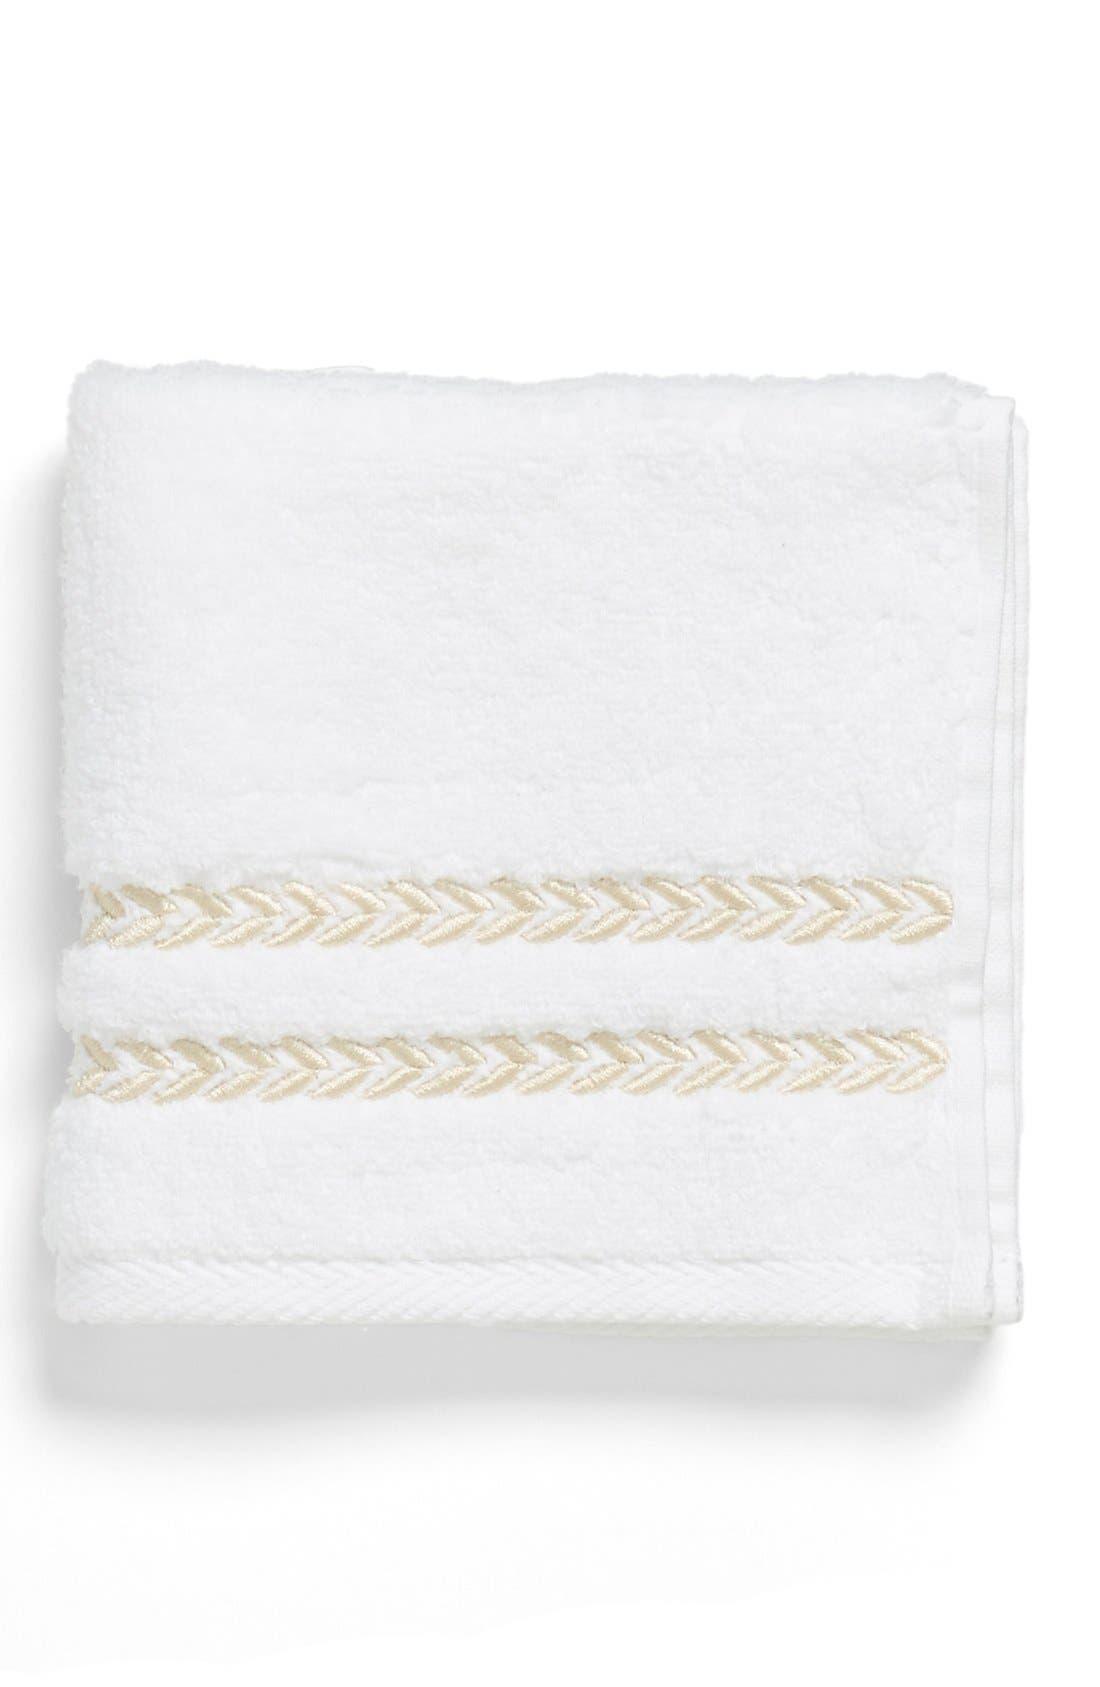 'Pearl Essence' Wash Towel,                         Main,                         color, 101